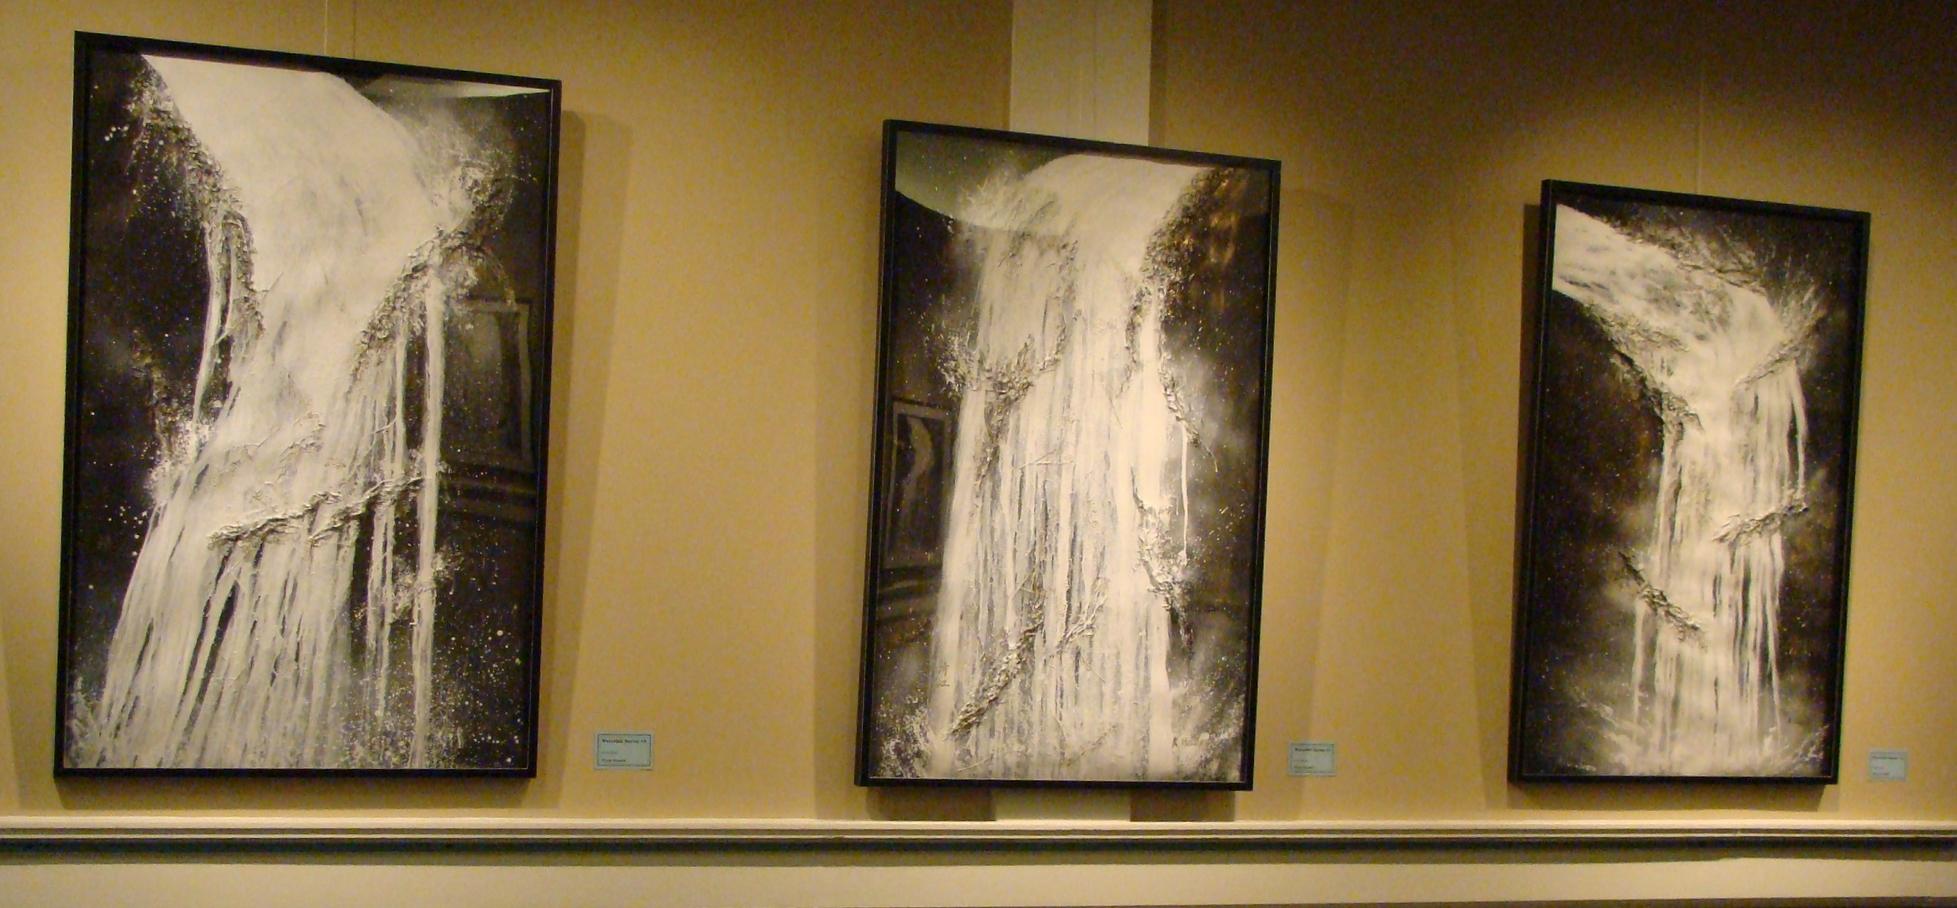 Kiyoe Waterfall Series